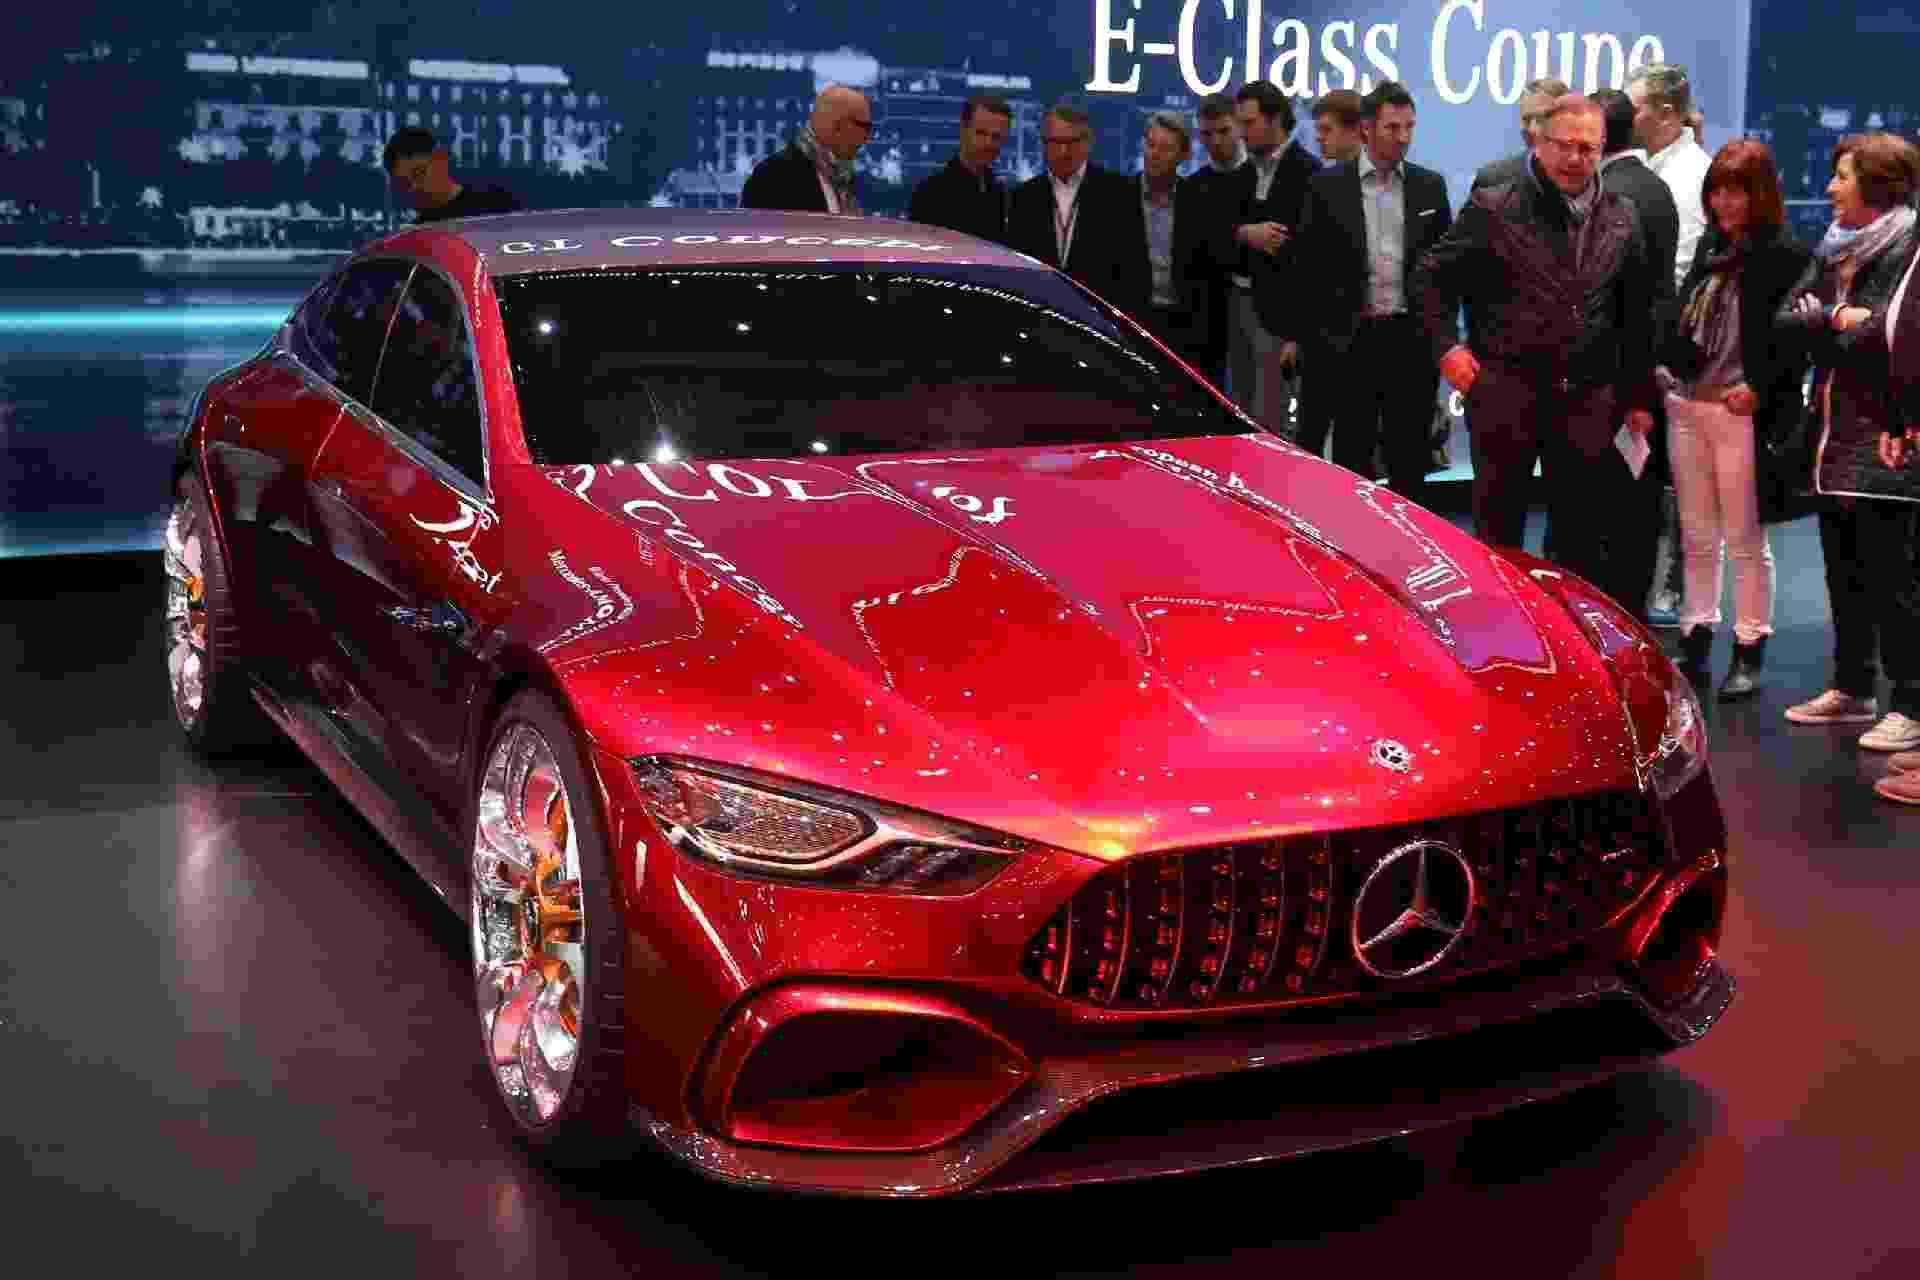 Mercedes-AMG GT Sedan Concept - Newspress